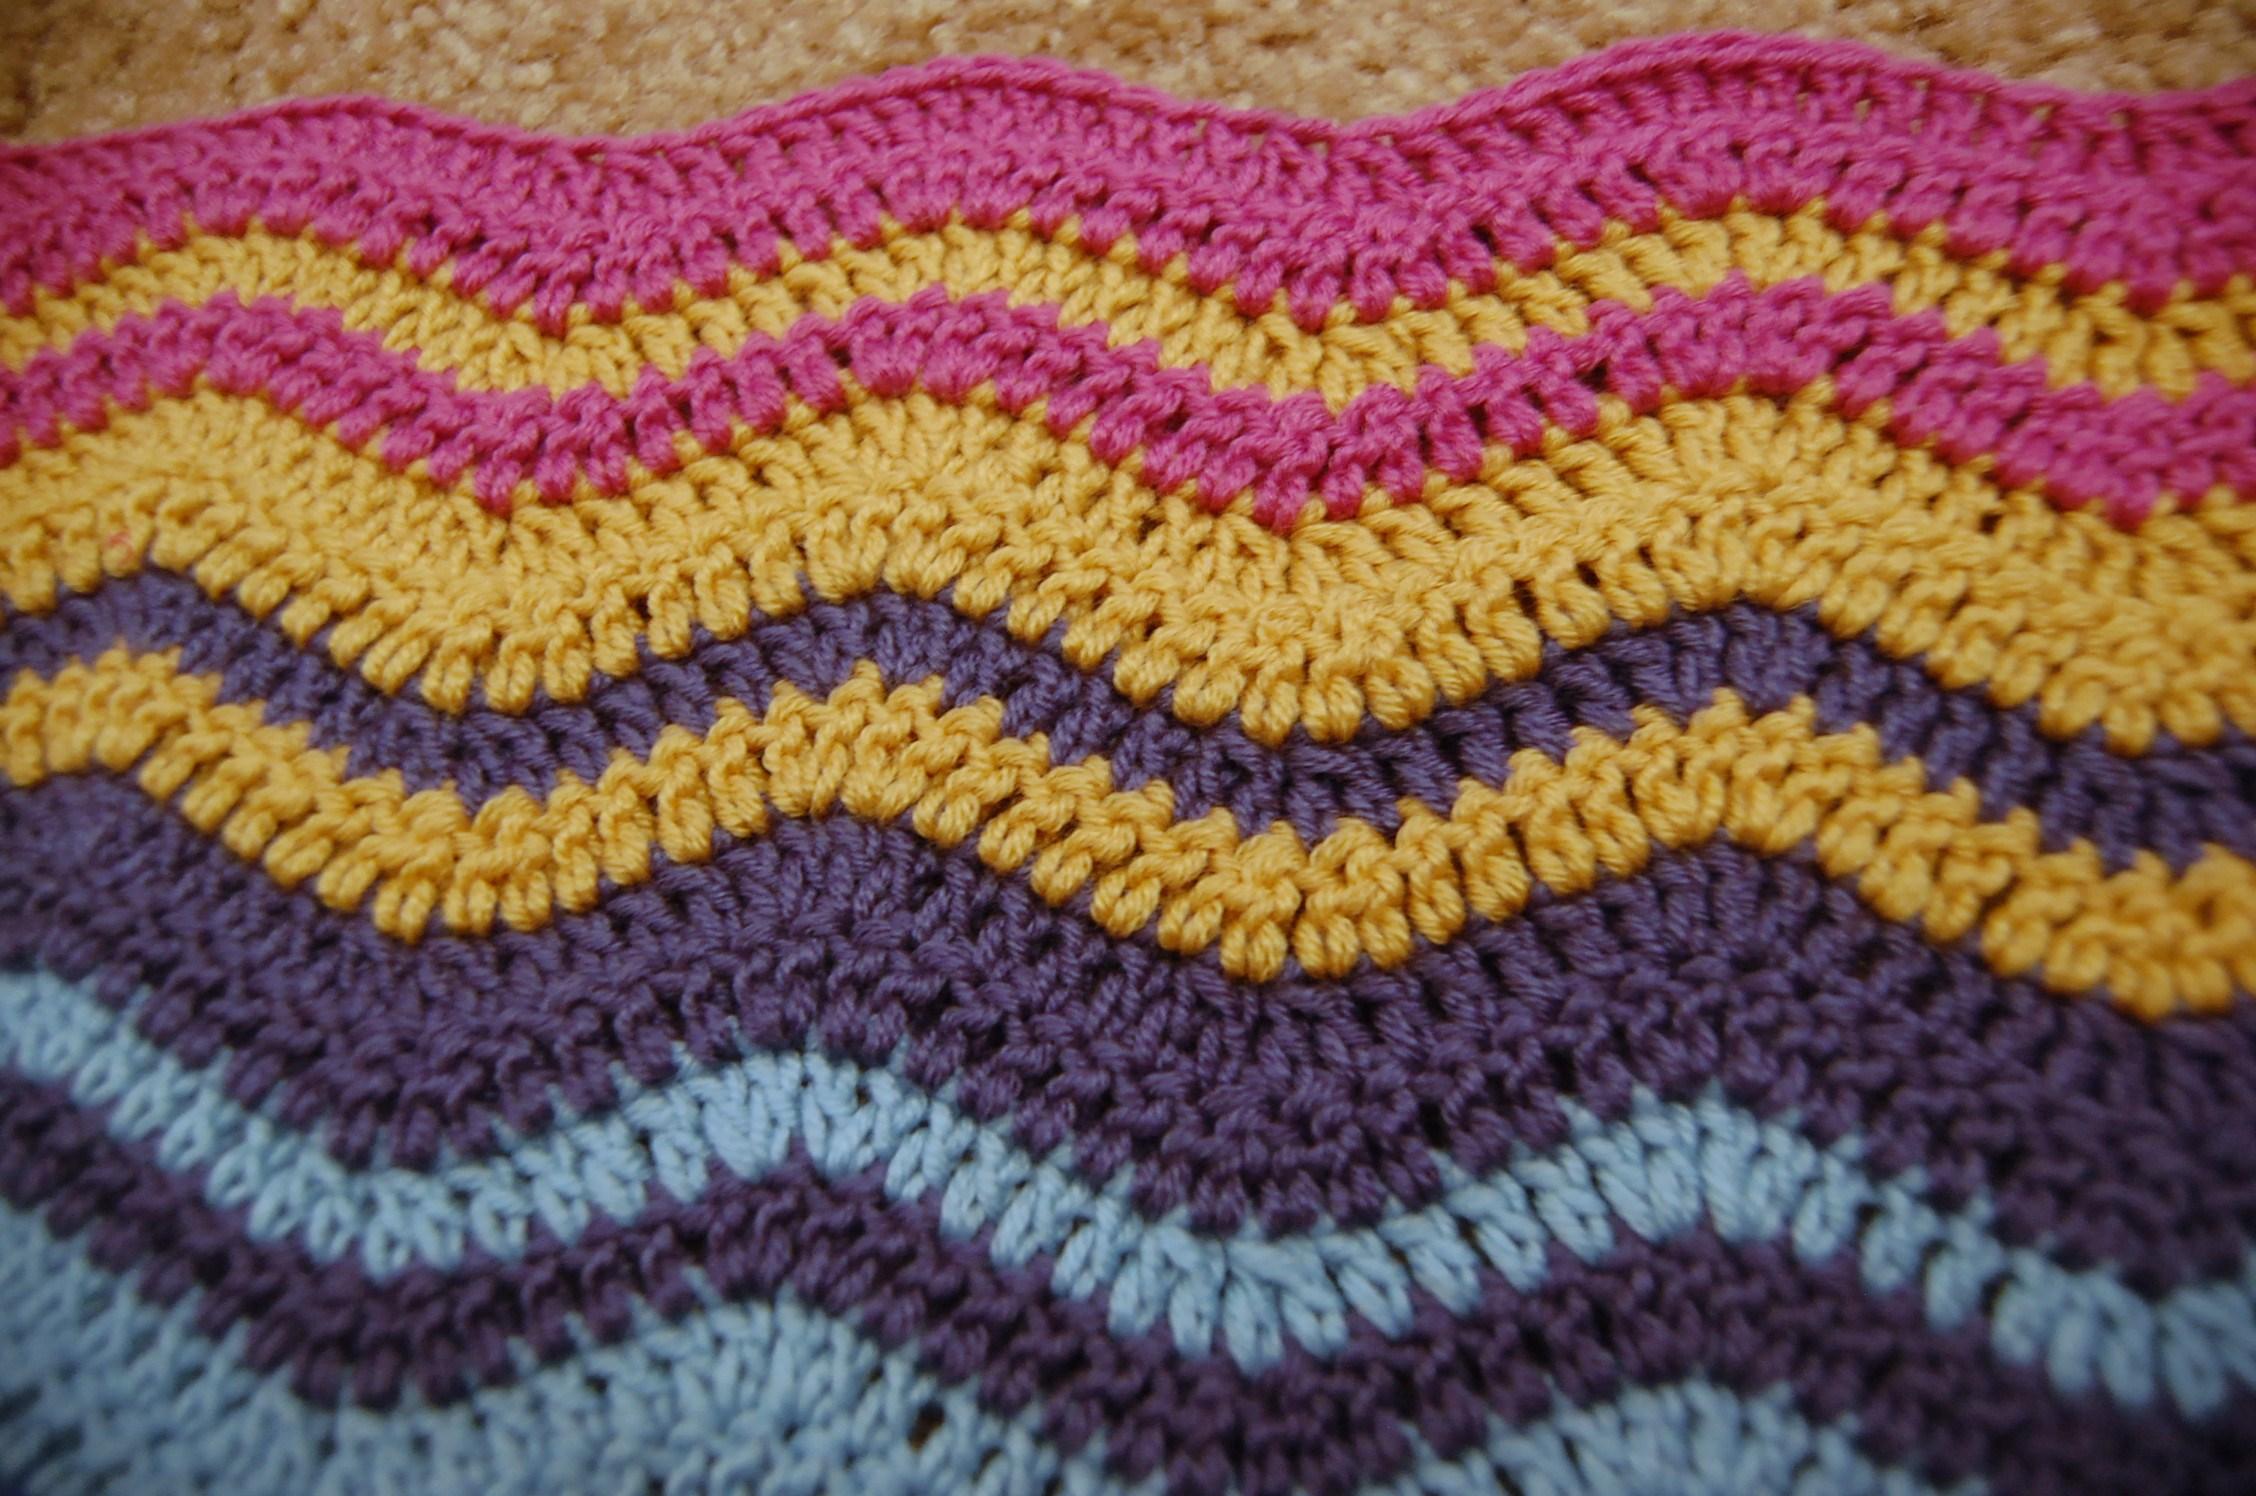 Afghan Patterns Crochet Ripple Crochet Ripple Blanket Pattern